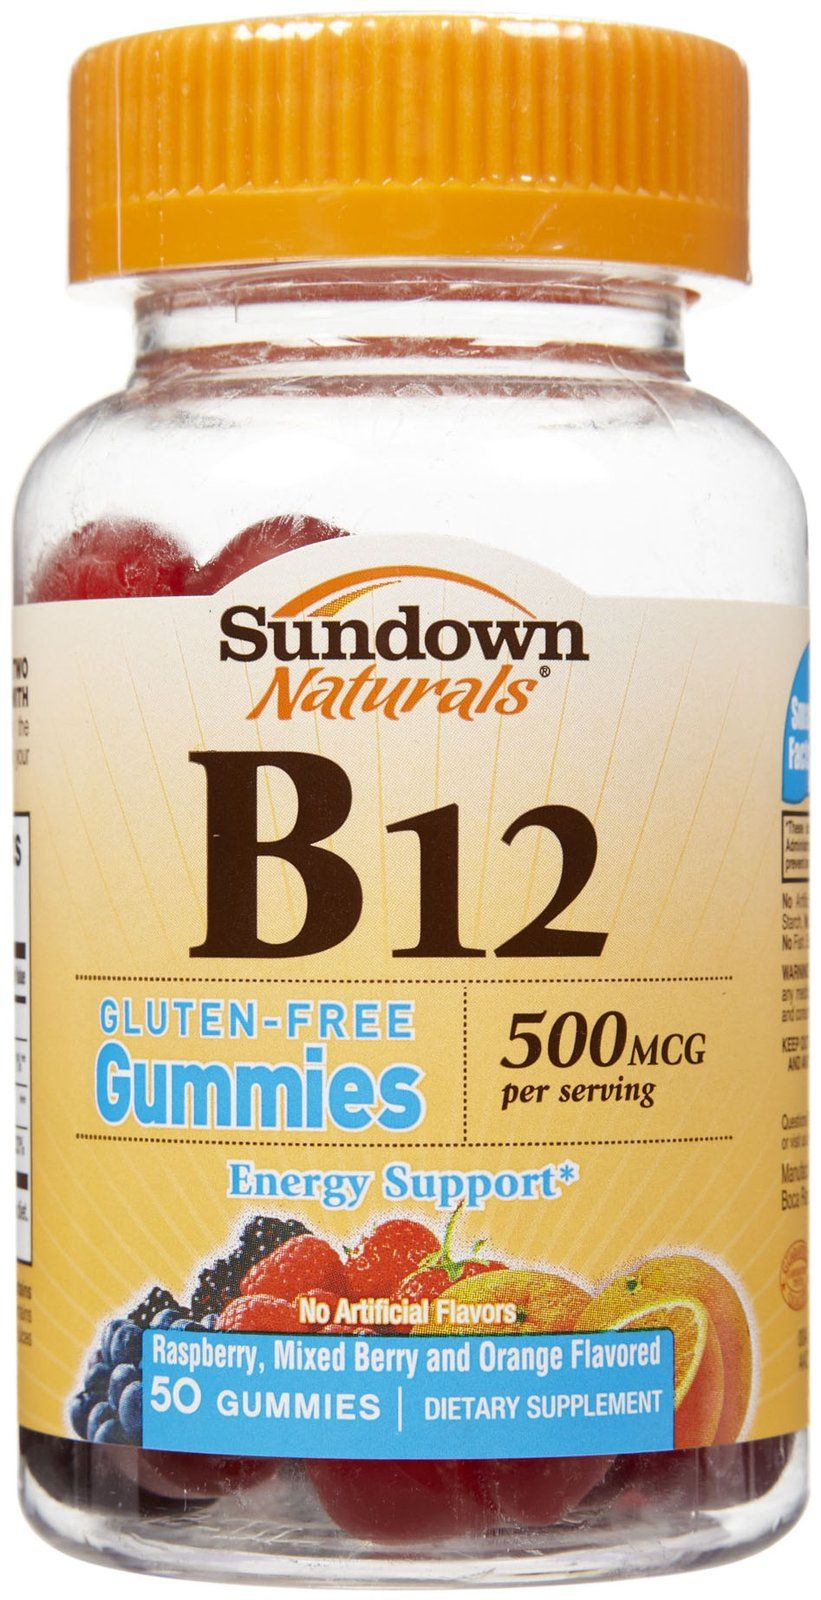 Sundown Naturals B12 Gummies 50 Ct Only 2 65 Reg 9 29 At Cvs Gummies Vitamins Natural Vitamins